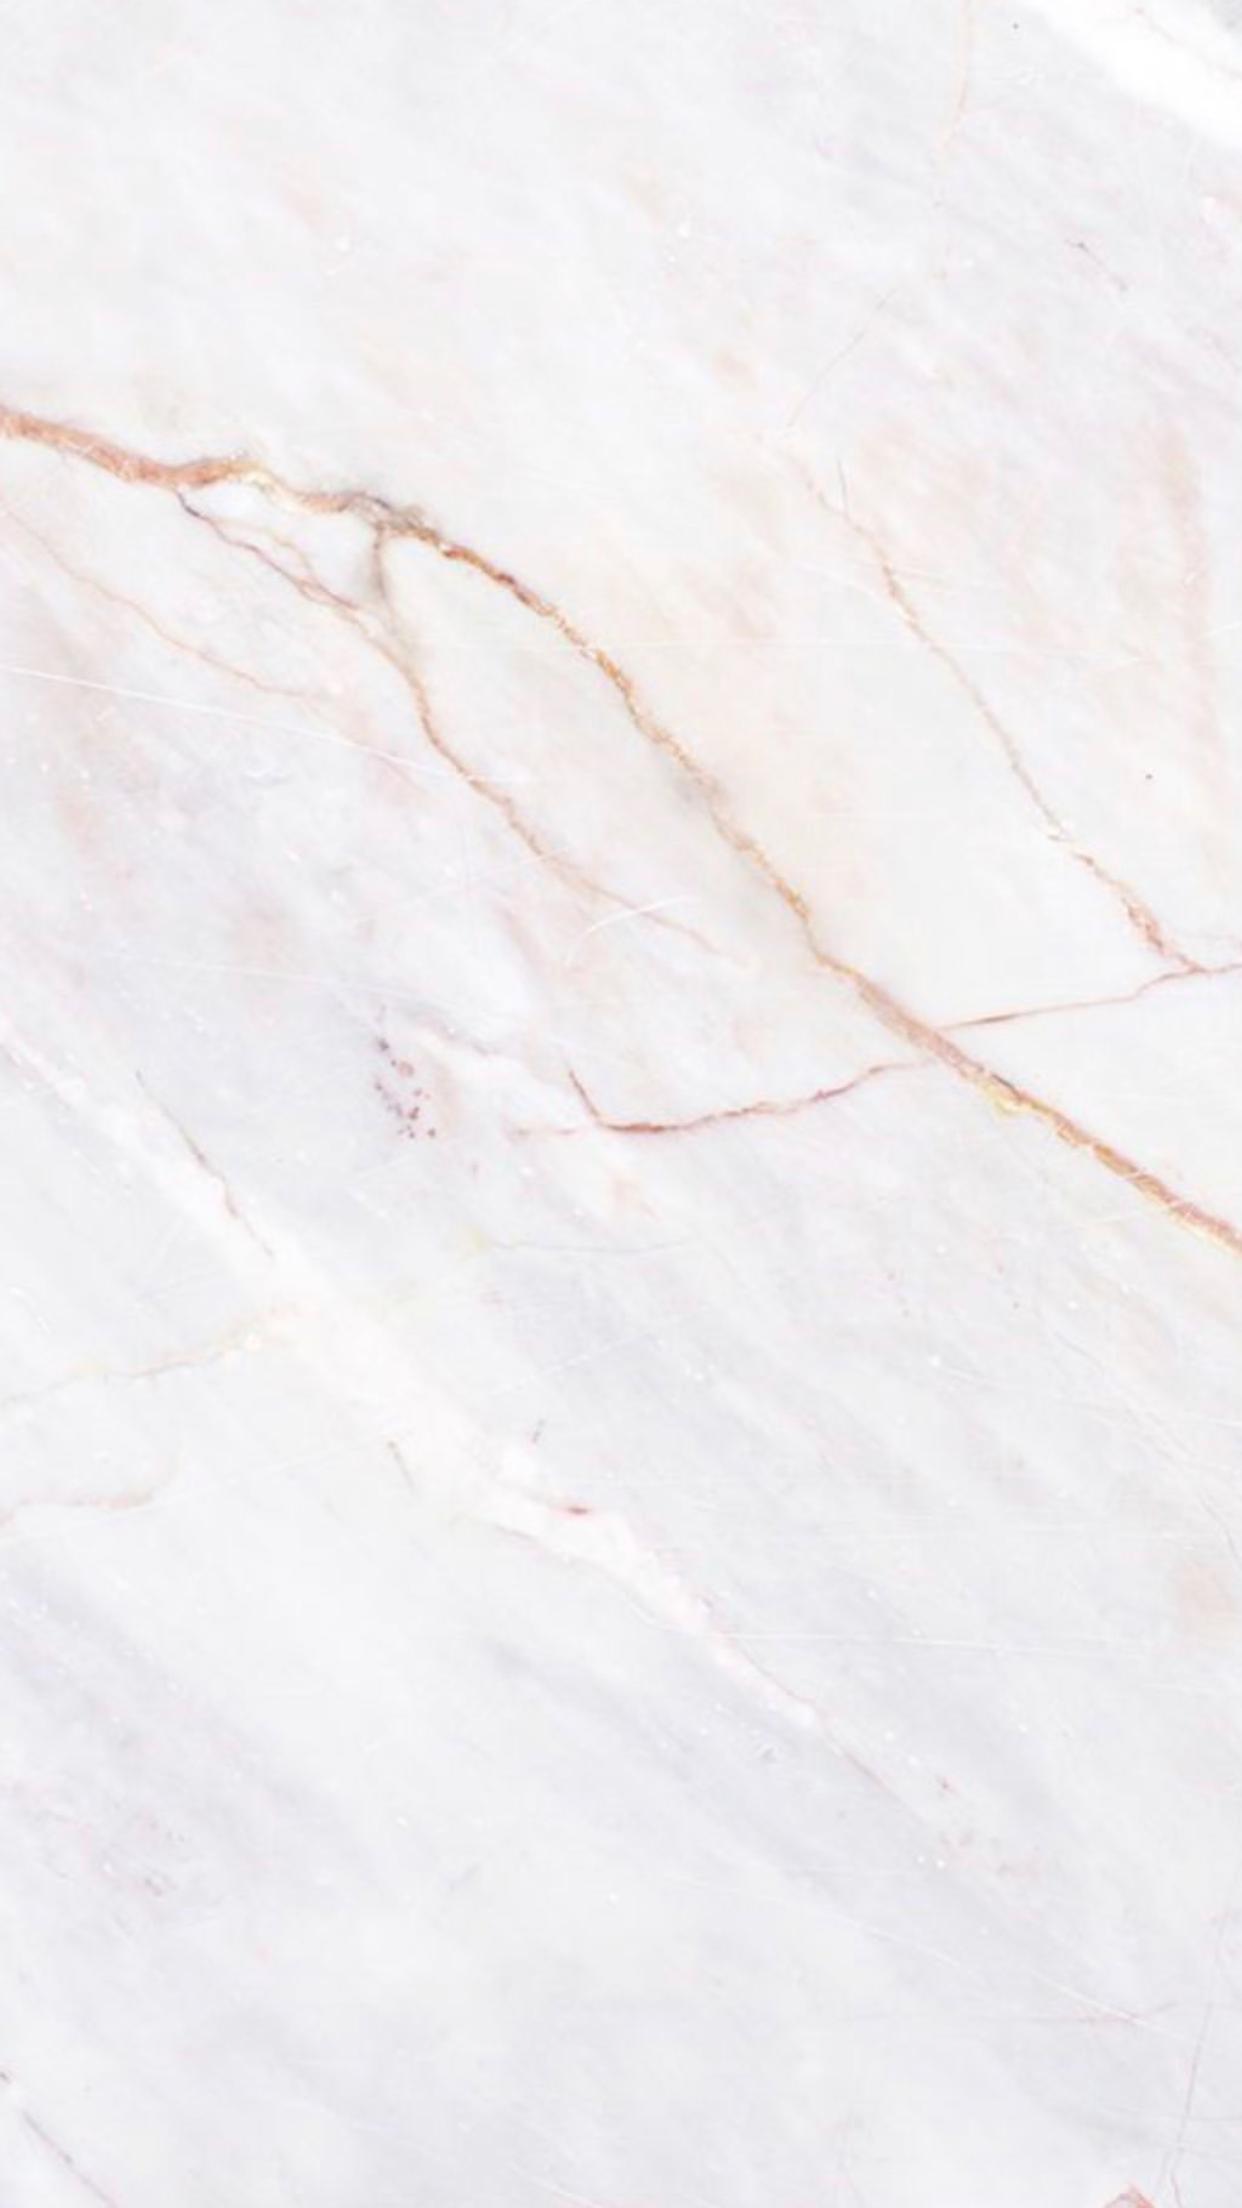 Pin By Paula Adolfina On Background Textured Wallpaper Marble Effect Wallpaper Marble Wallpaper Phone